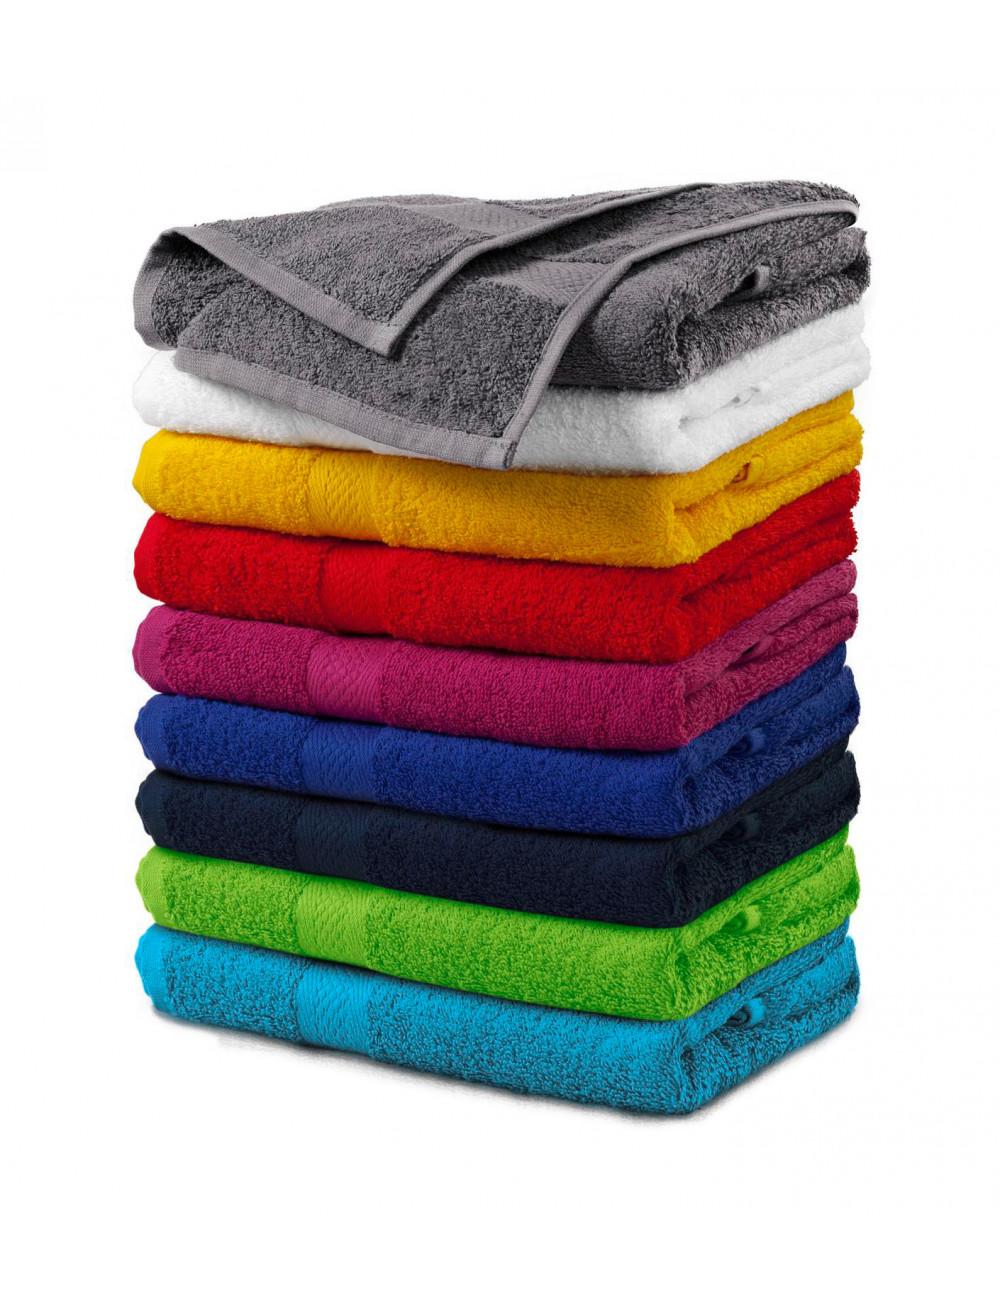 Adler MALFINI Ręcznik unisex Terry Towel 903 turkus